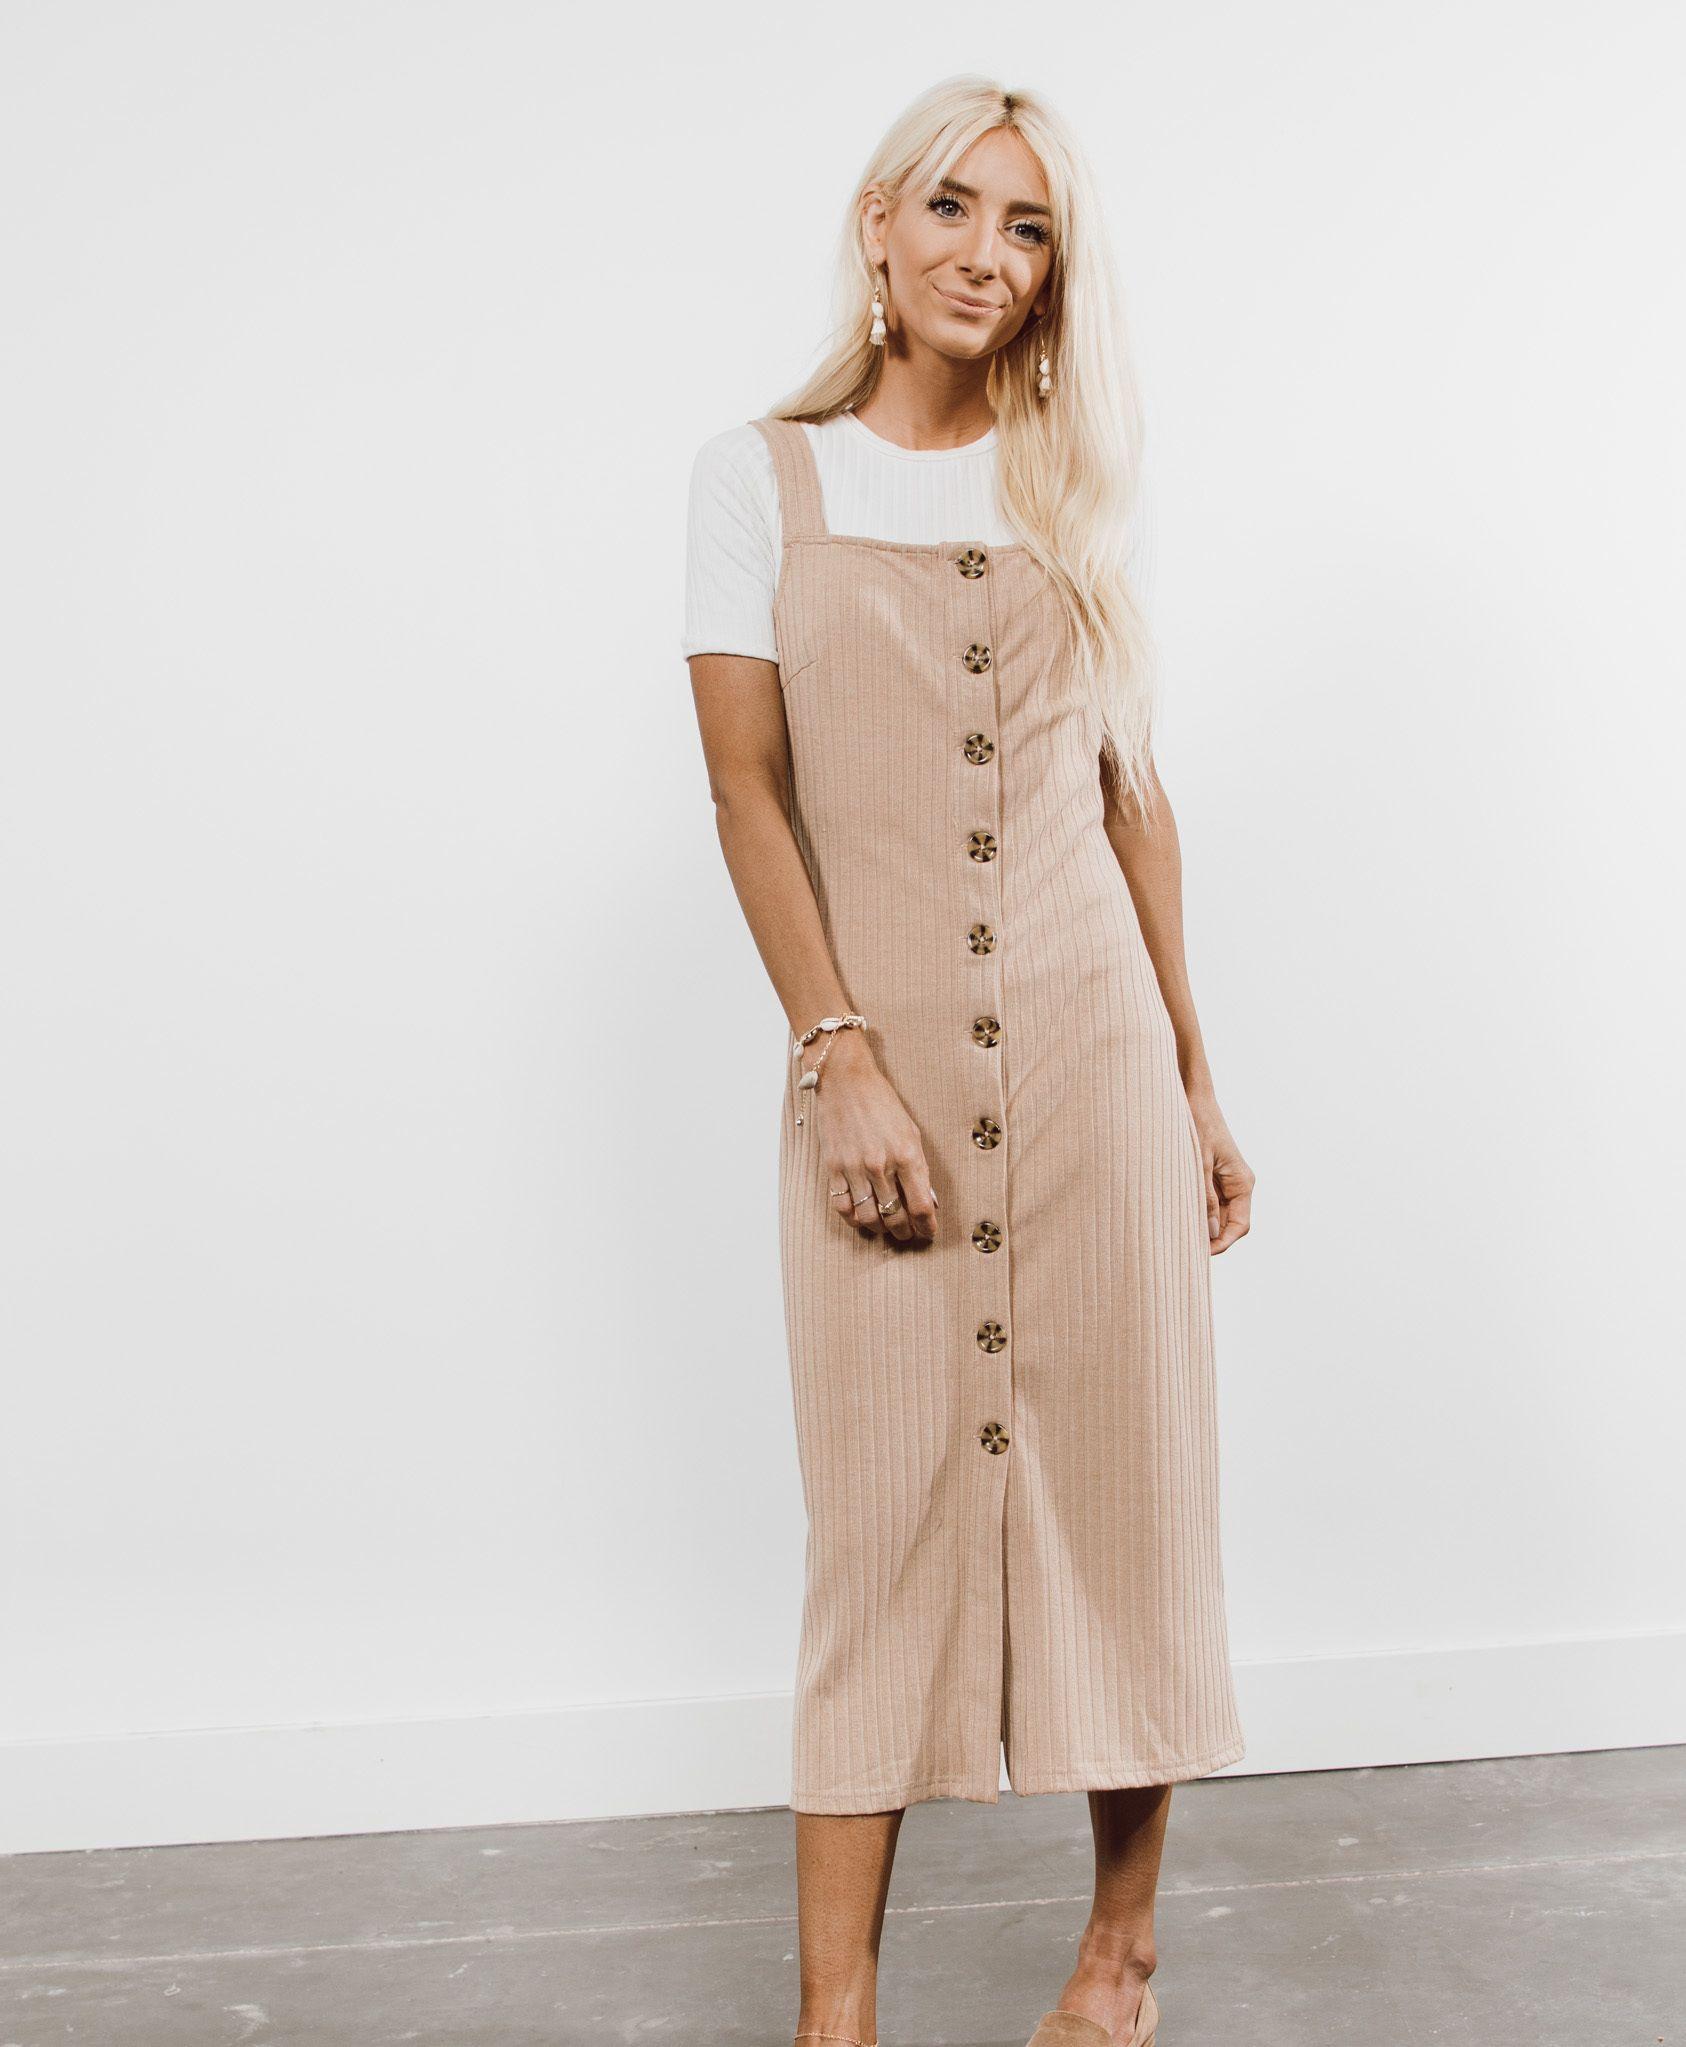 fbf048a206ea Alecia Midi Dress in 2019 | Stevie Style | Dresses, Fashion ...